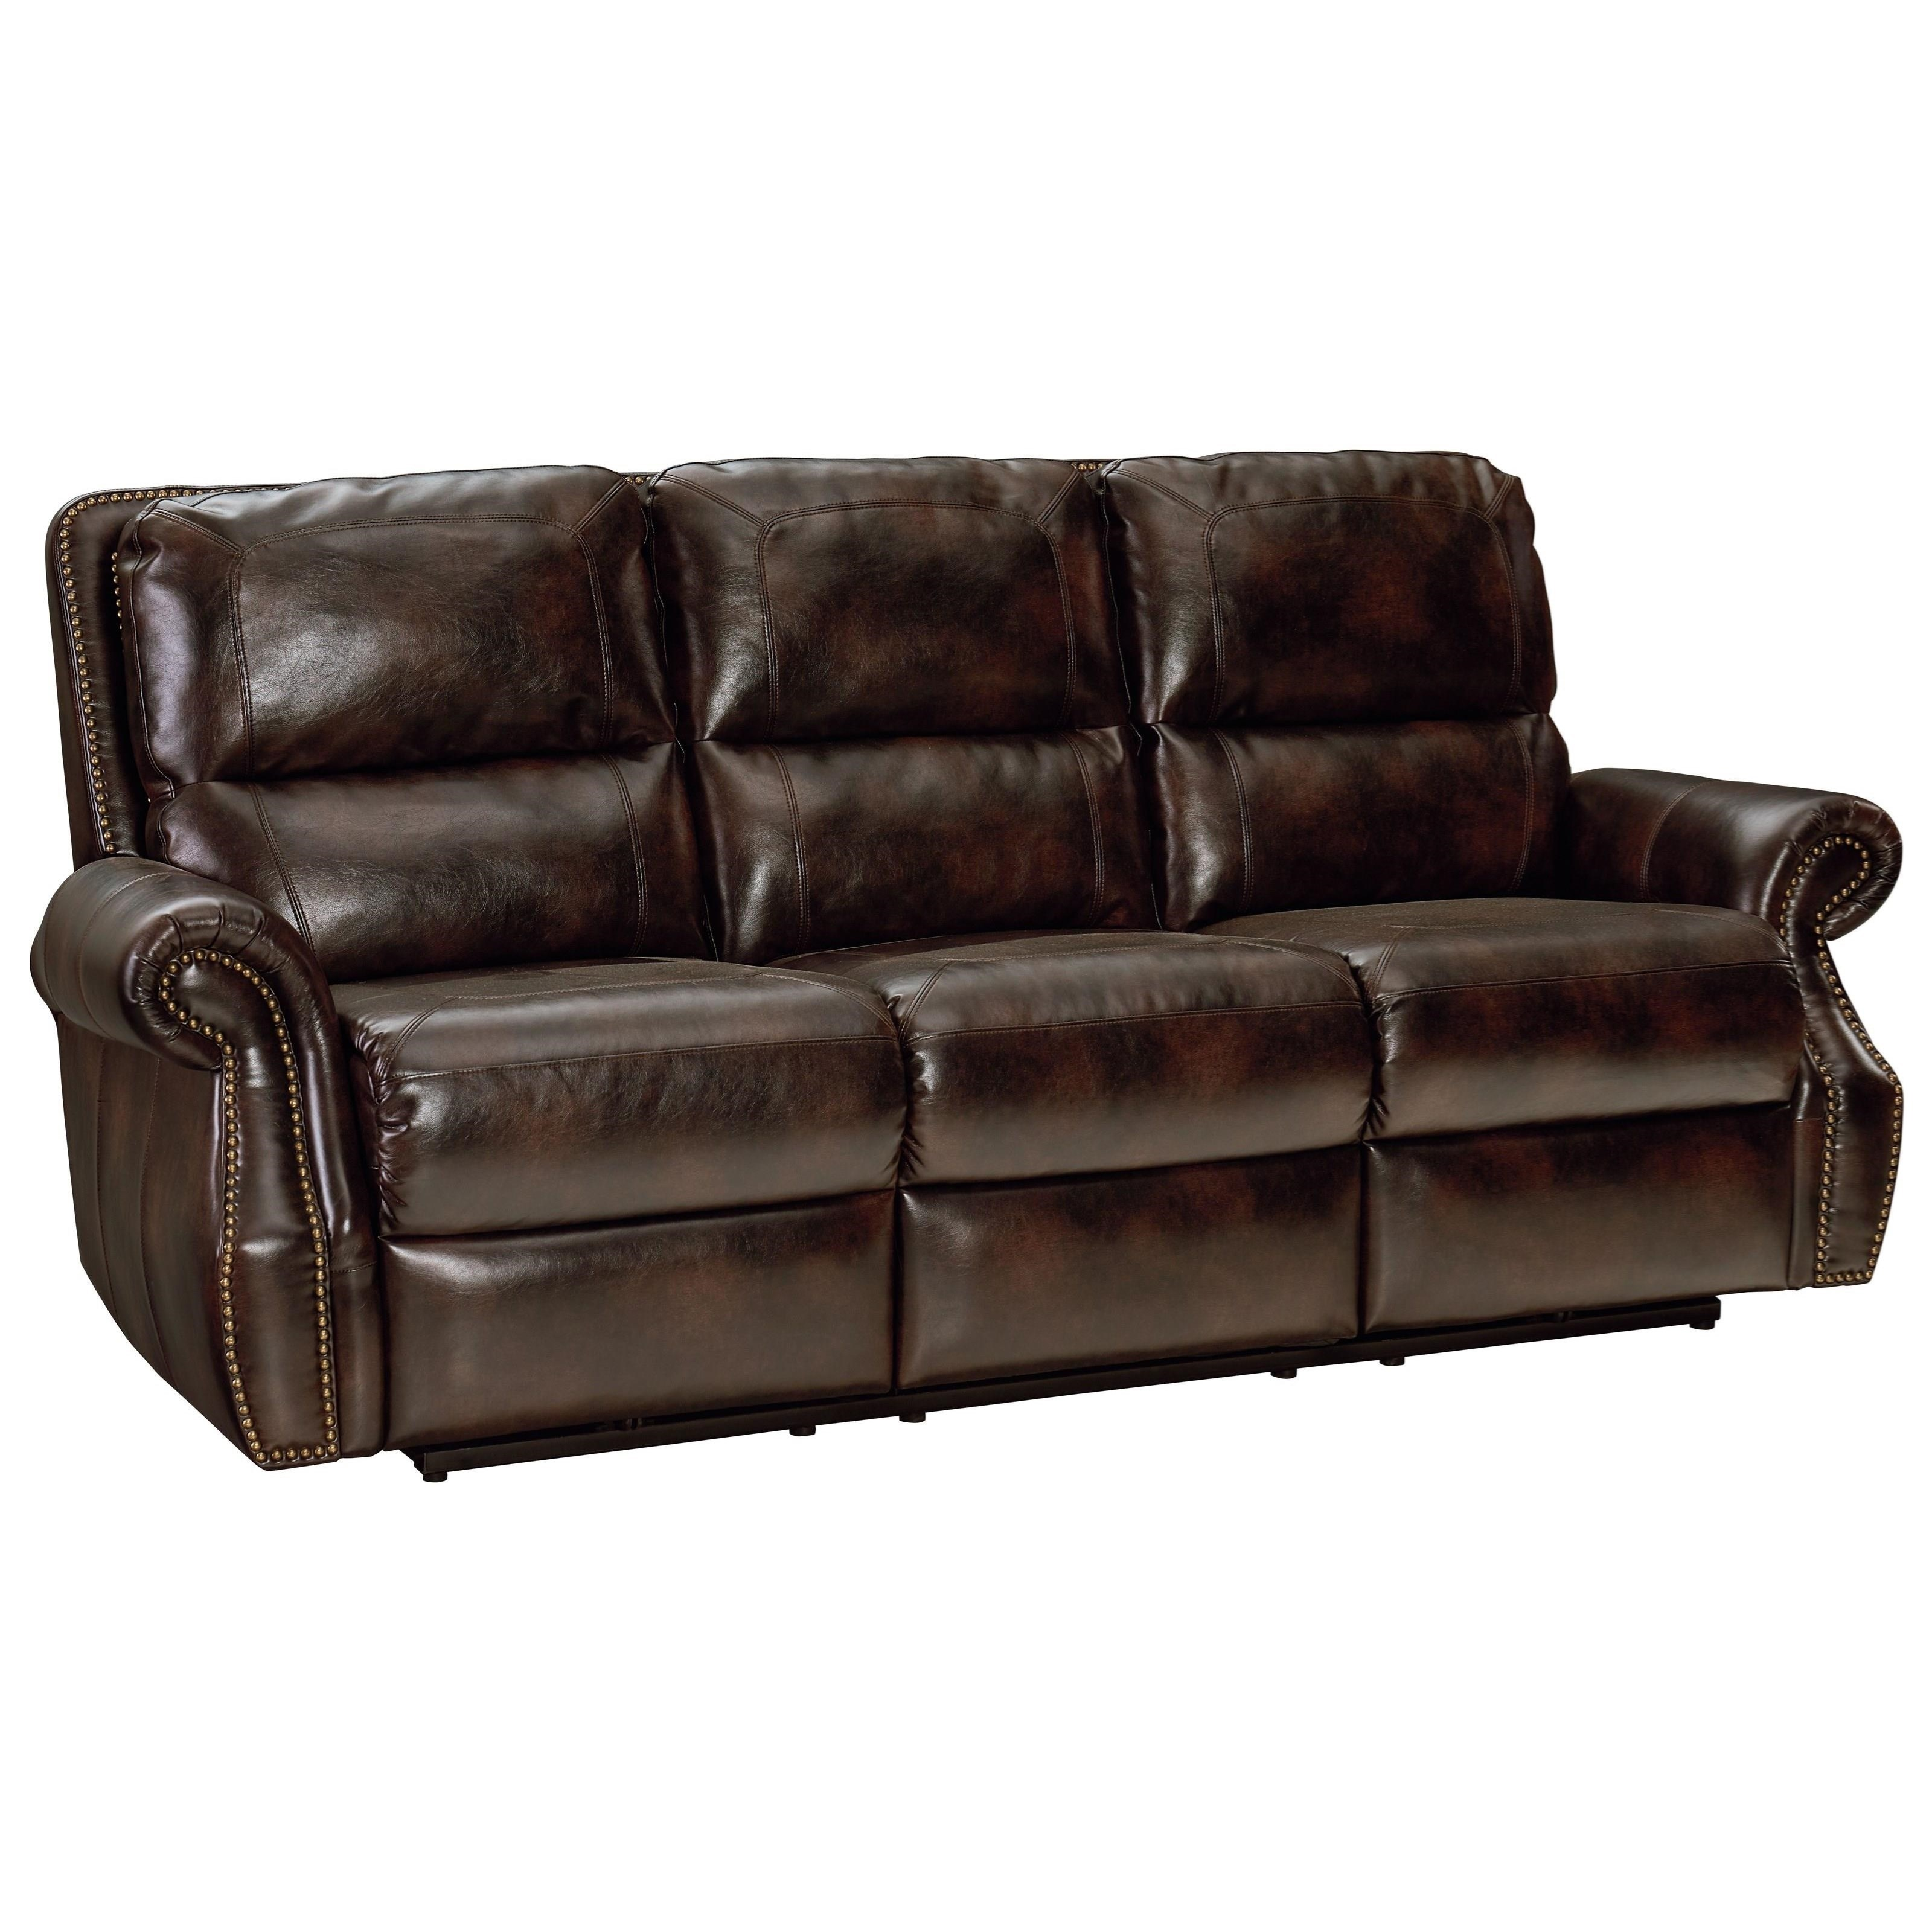 reclining sofa with nailhead trim deep seat outdoor cushions standard furniture kingston traditional